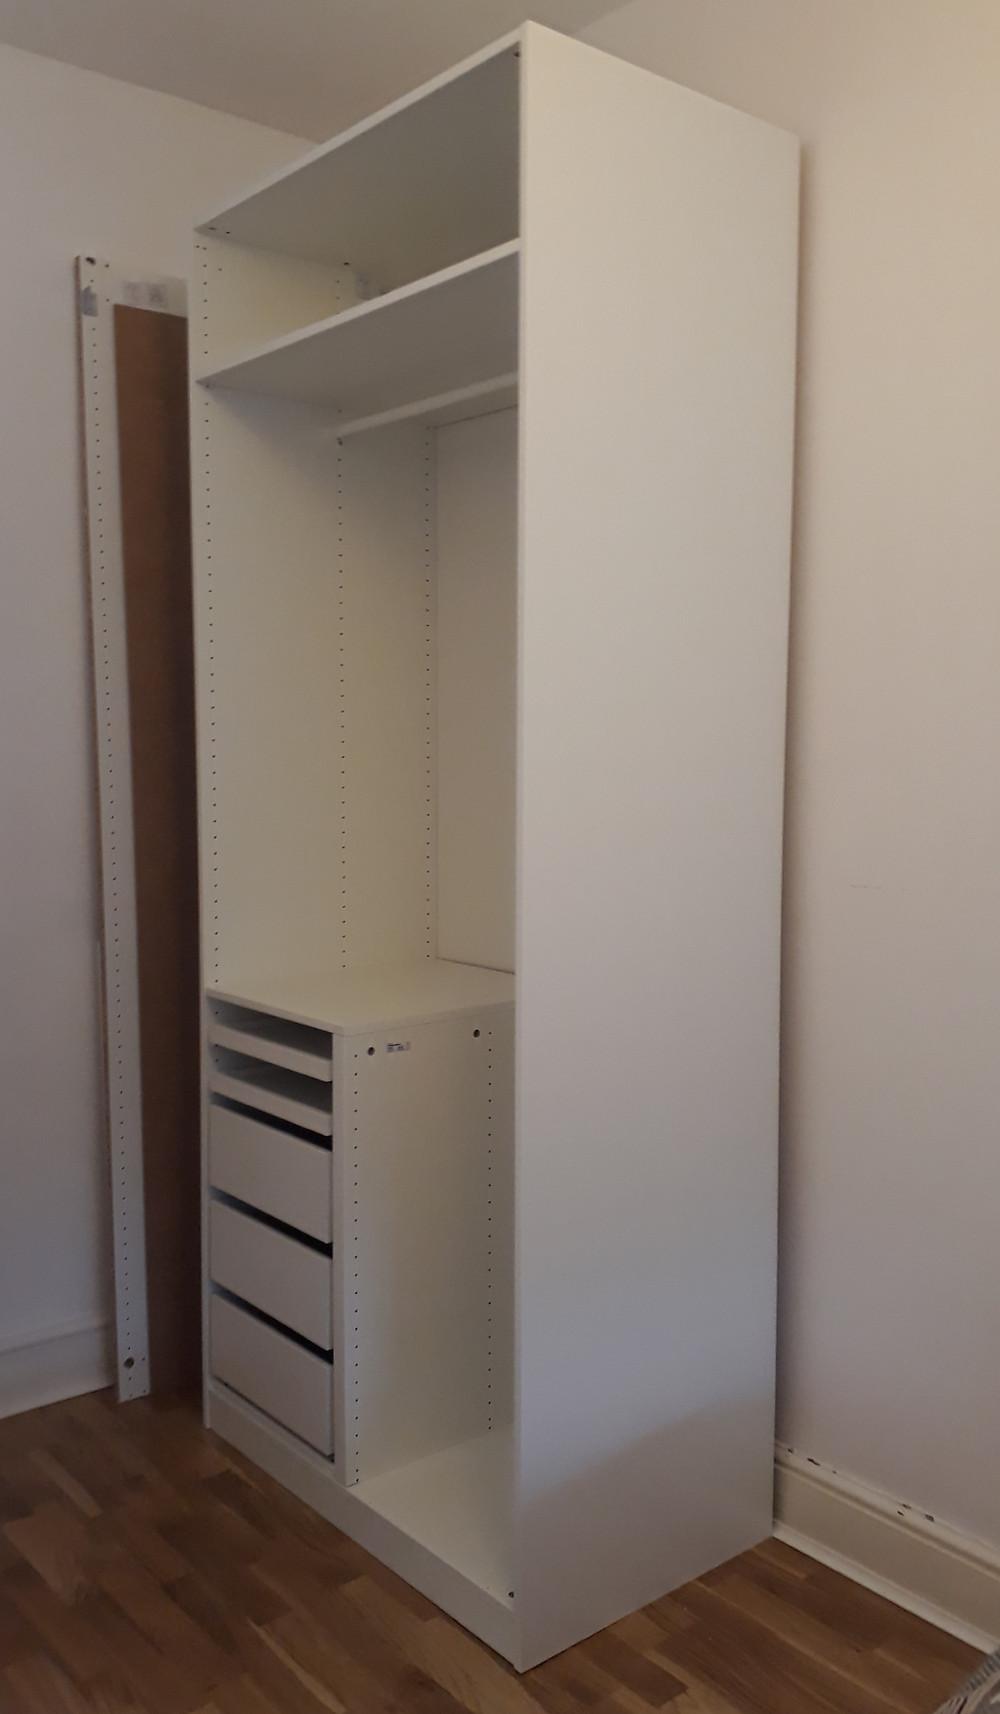 IKEA Pax wardrobe, Komplement drawers